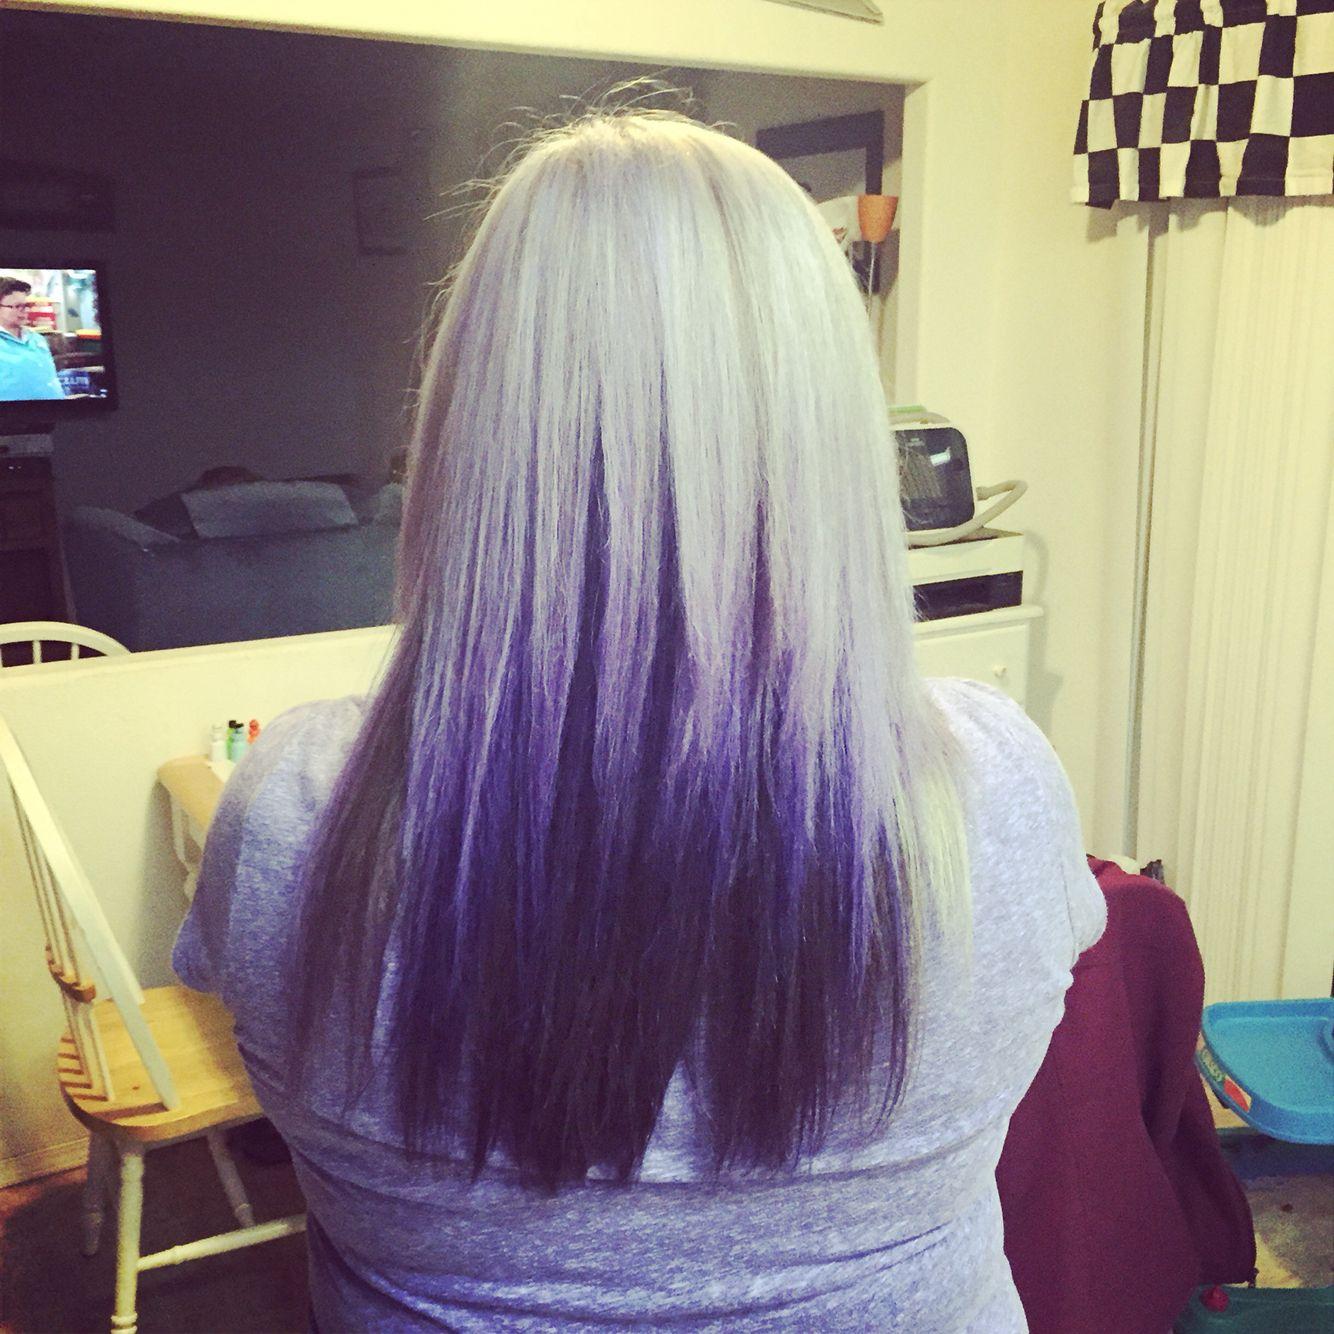 Tada! :) hair by @christamrood12 Monroe, WA  Hair, Hair styles